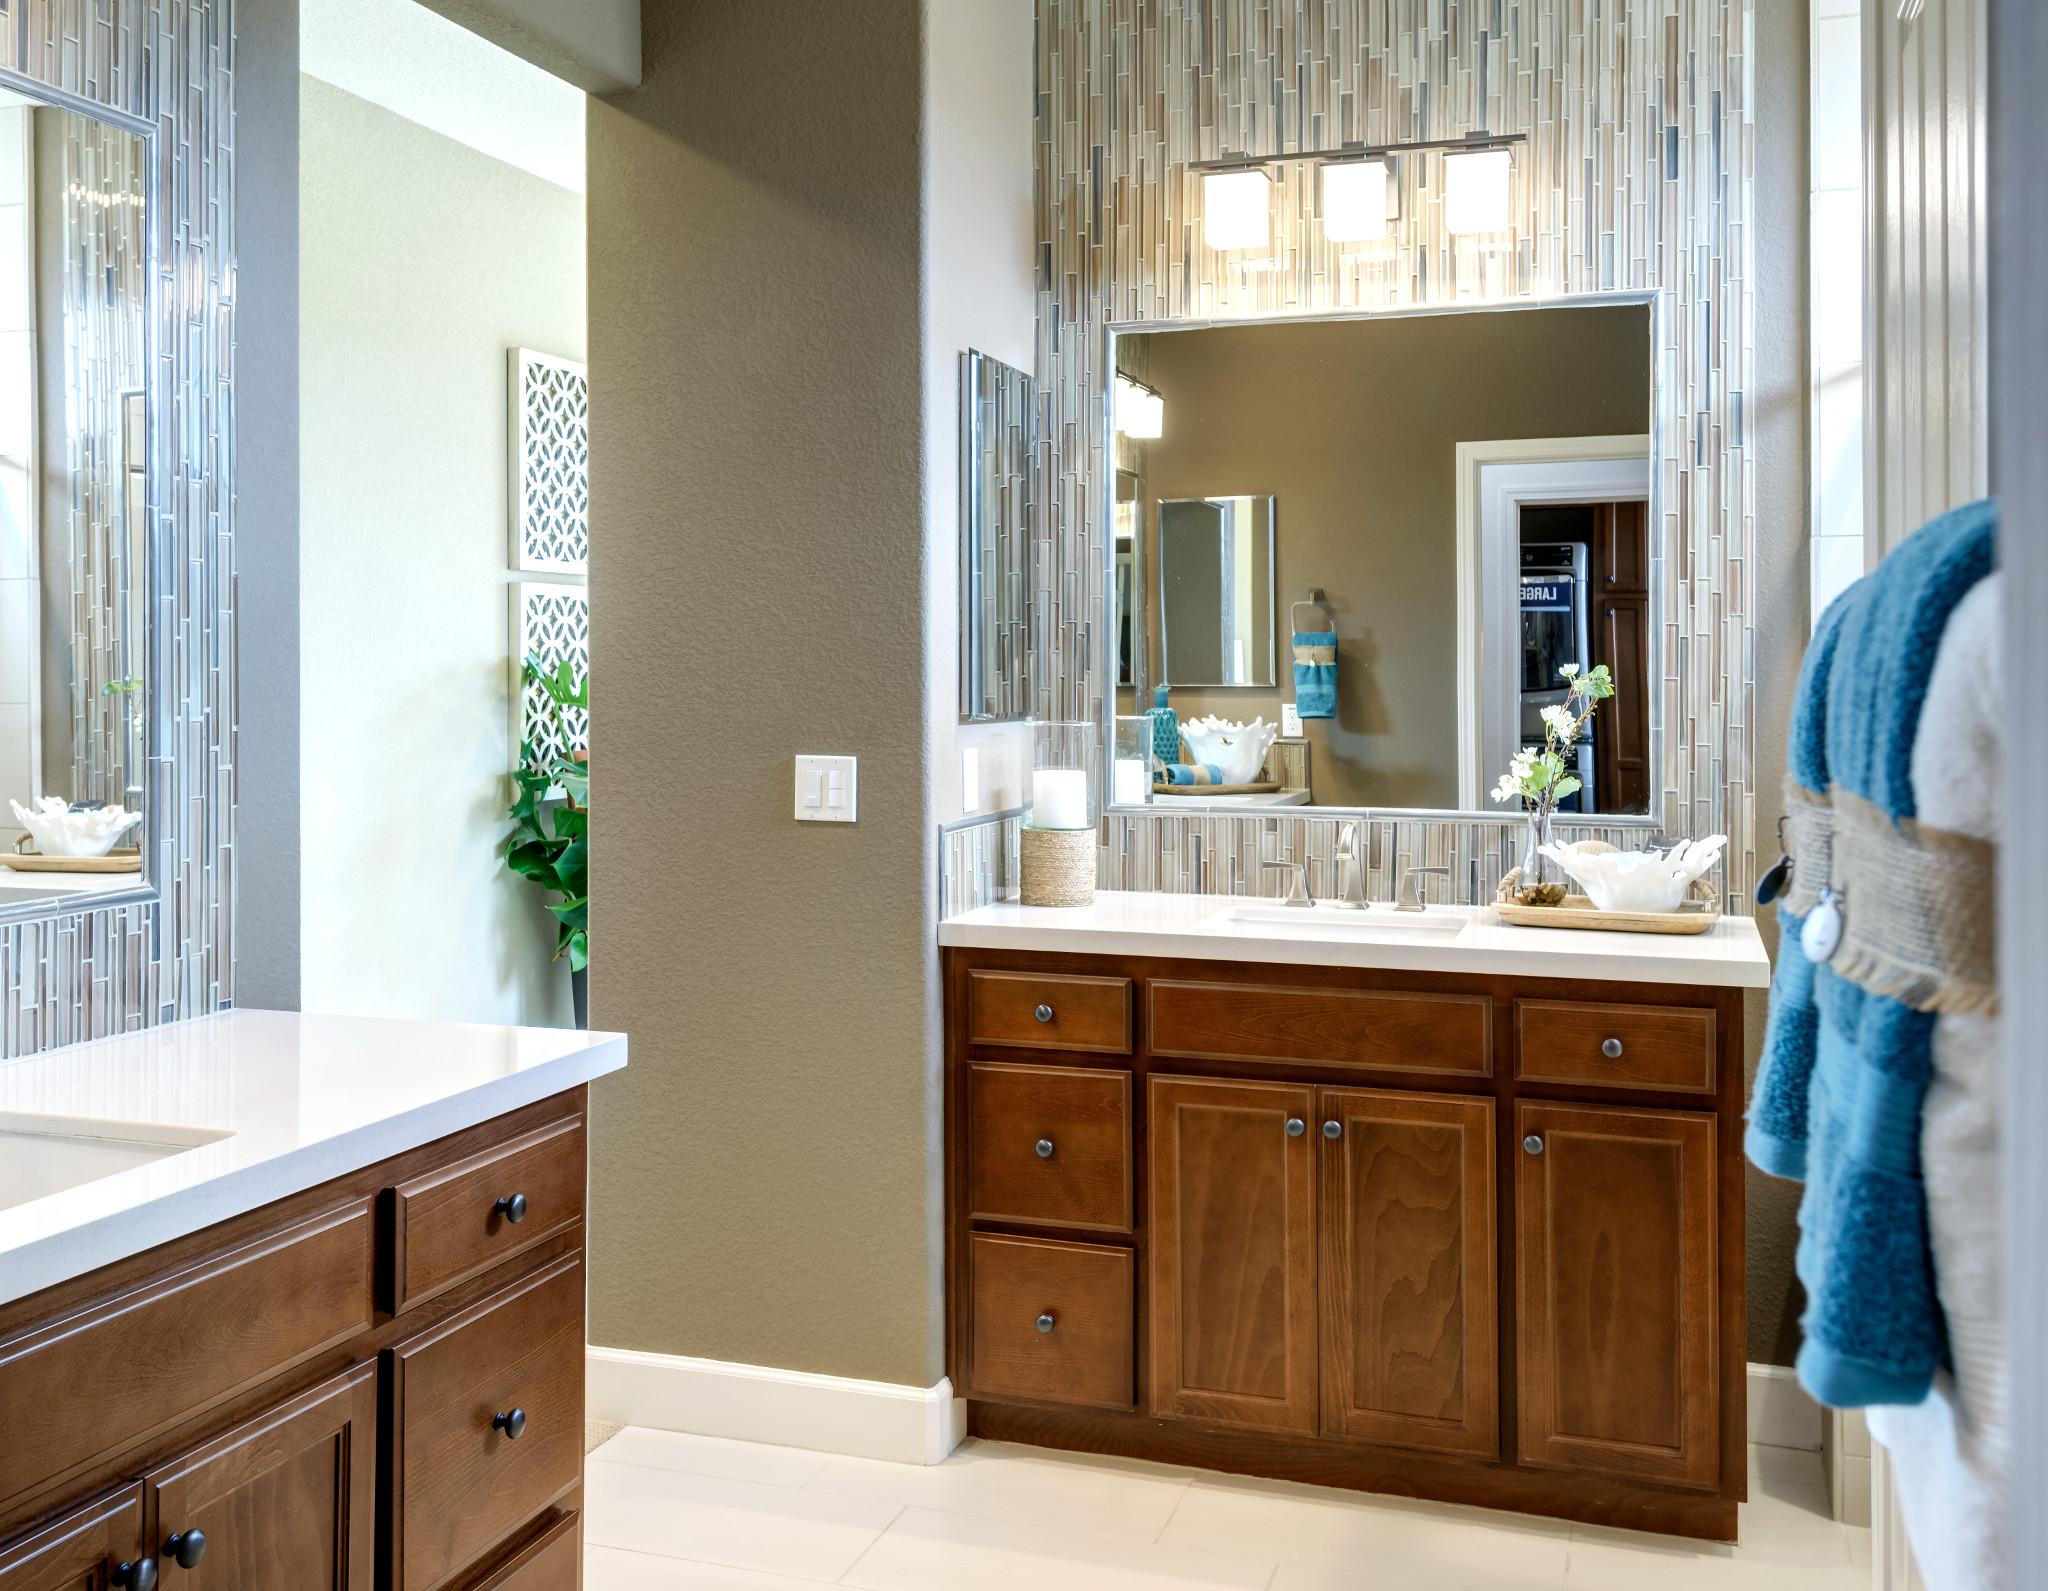 Trilogy Rio Vista Reflect Master Bathroom